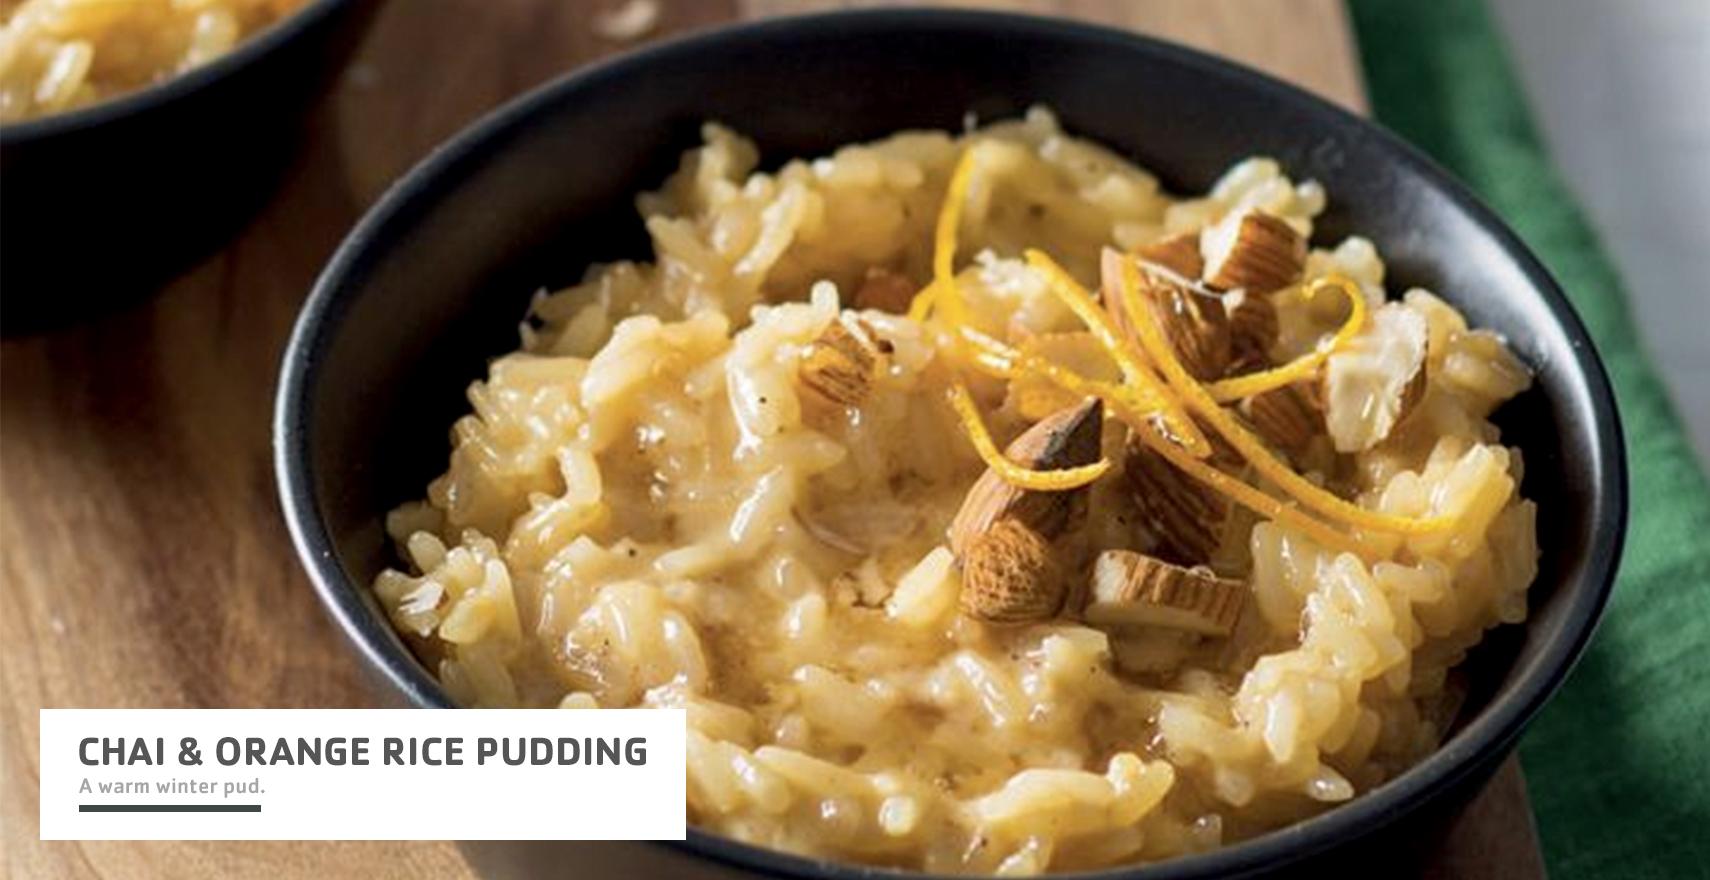 Chai-&-Orange-Rice-Pudding.jpg